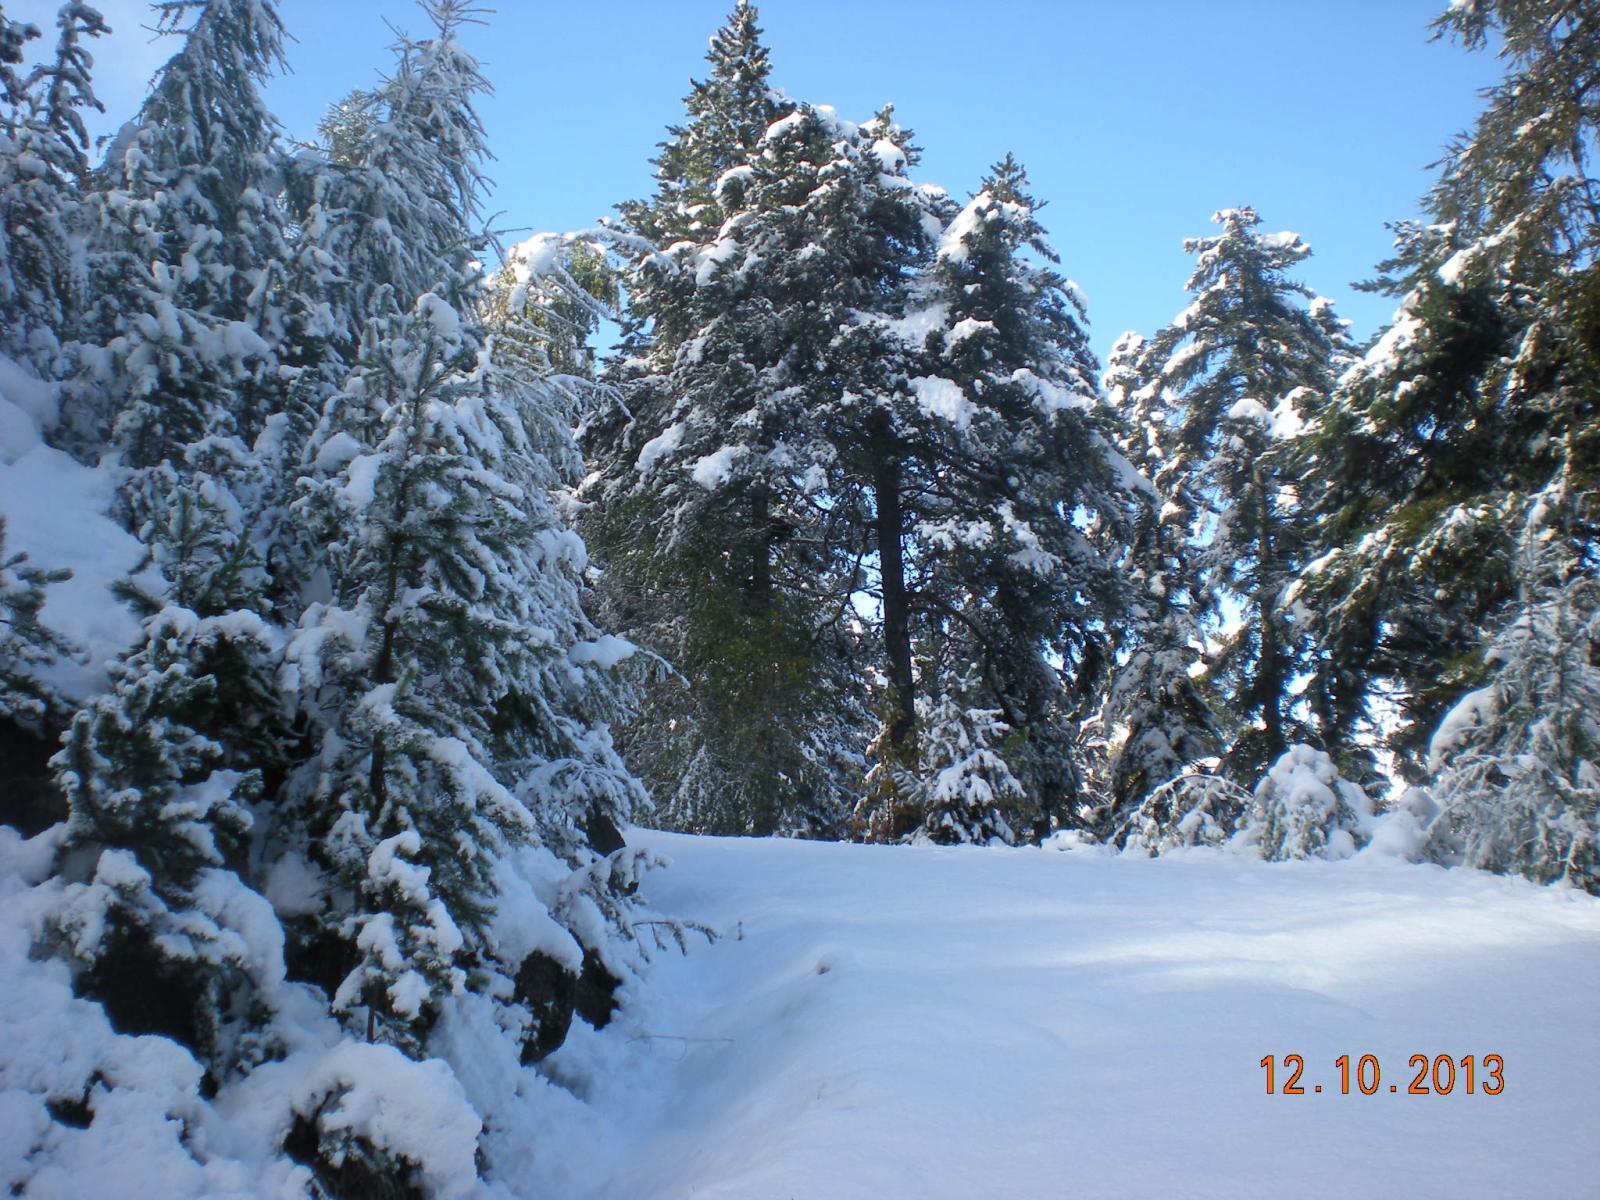 nevicata precoce sopra Cloutraz